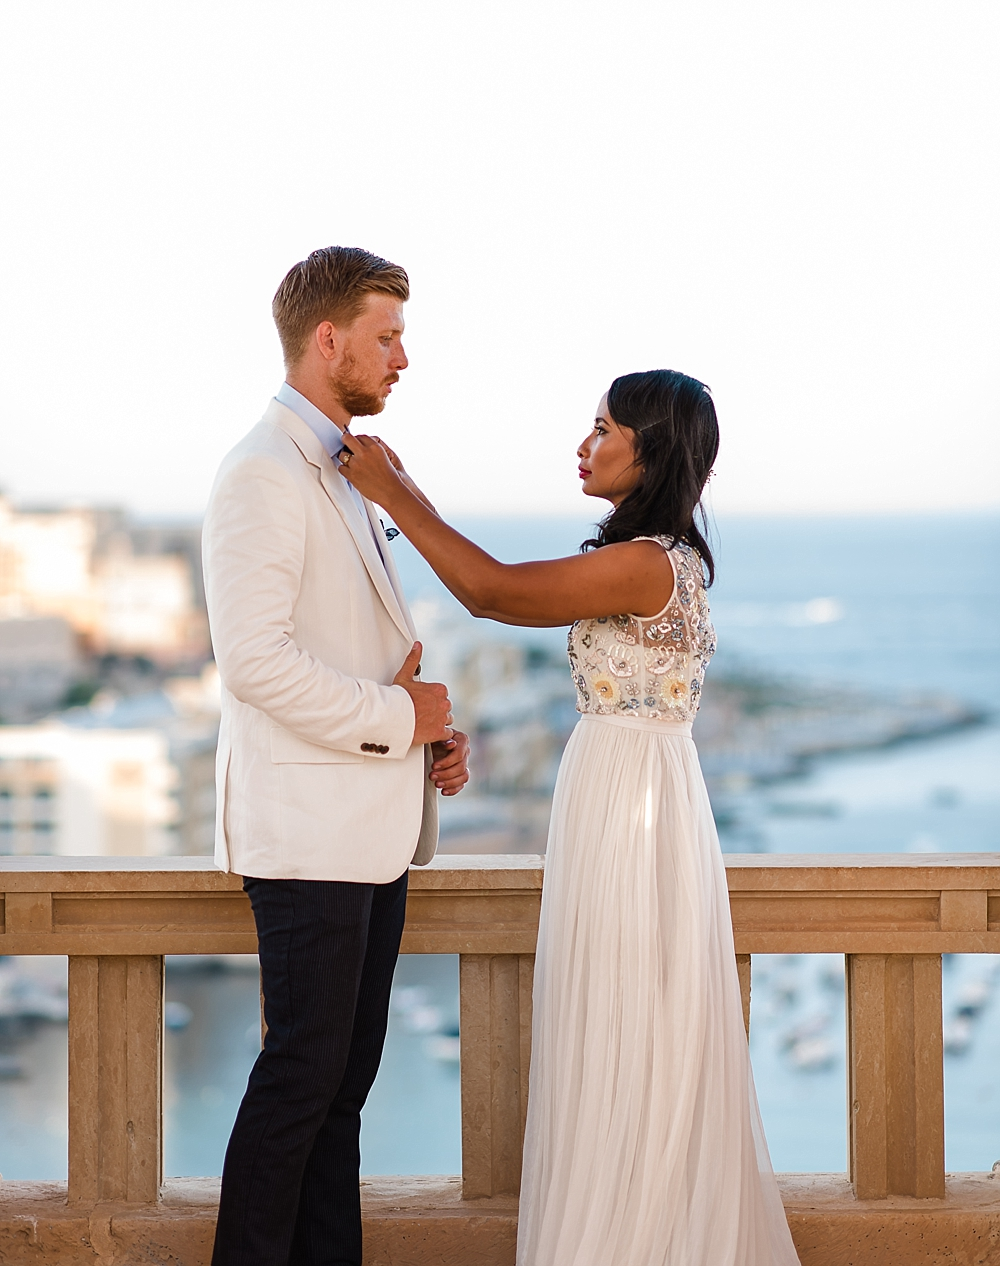 Wedding Party - Great Gatsby Theme - Photography Malta - Shane P. Watts